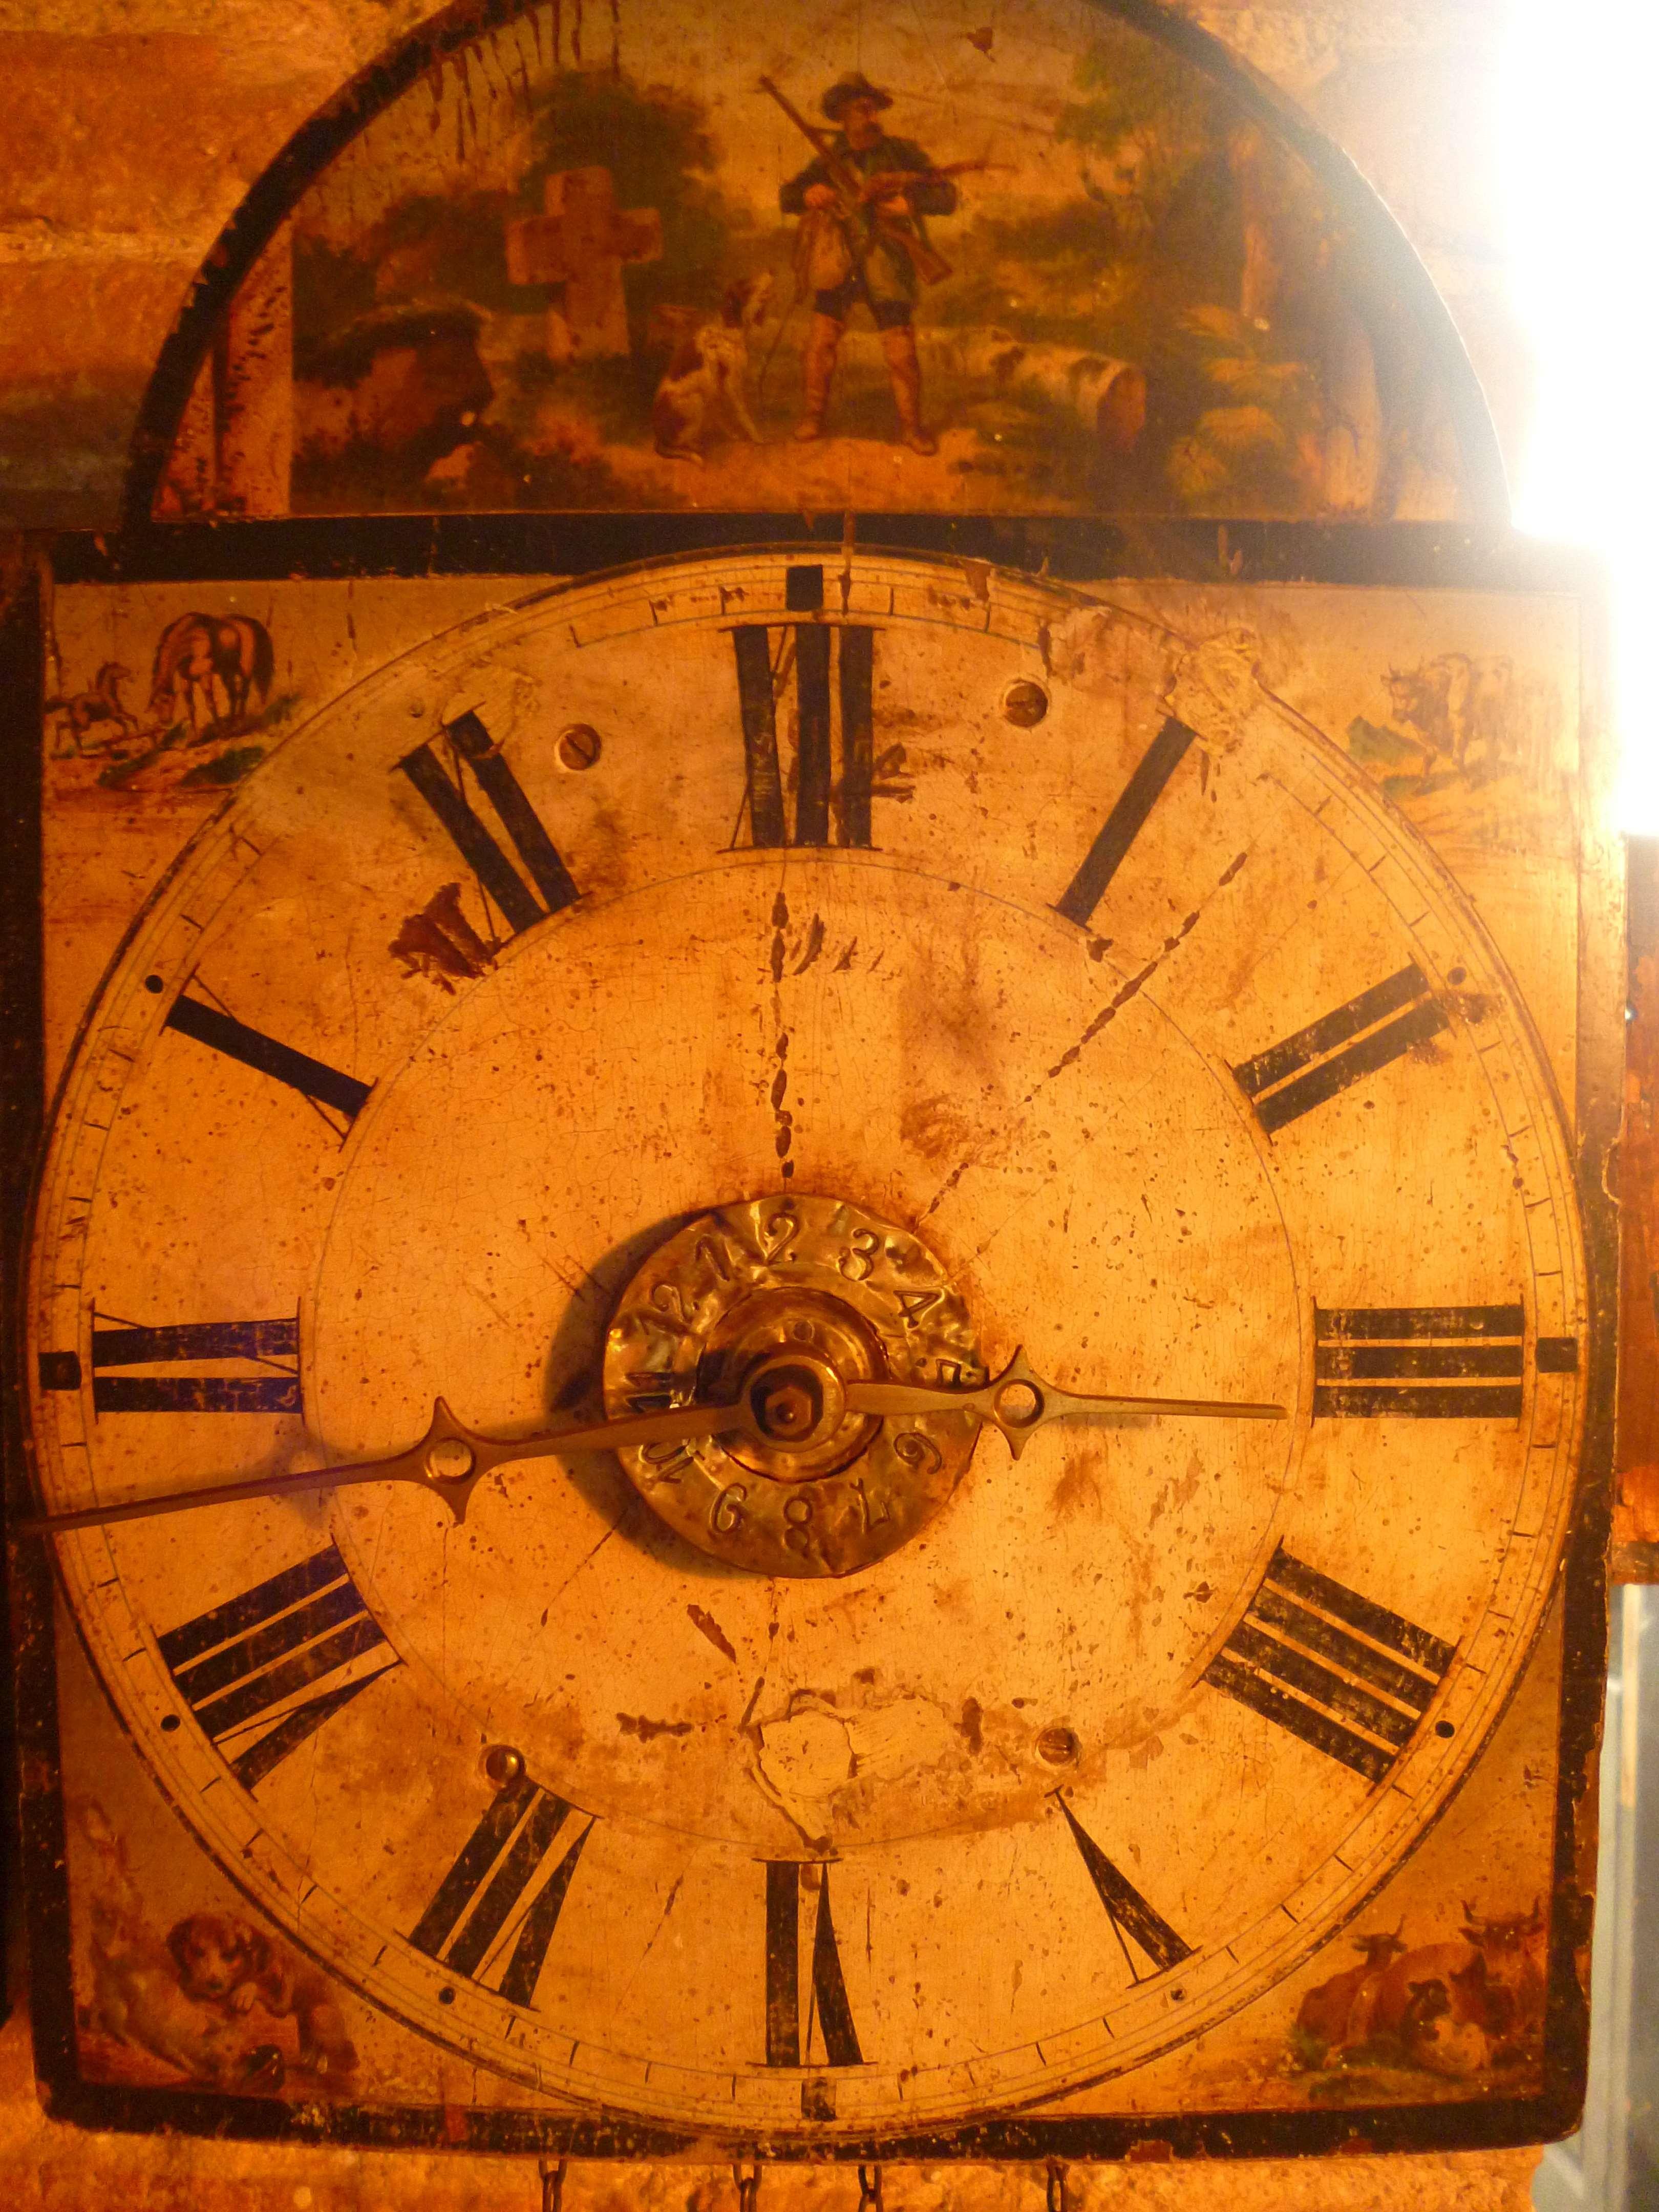 Reloj pared selva negra antiguedad madera mobiliario interiorismo - Relojes pared antiguos ...